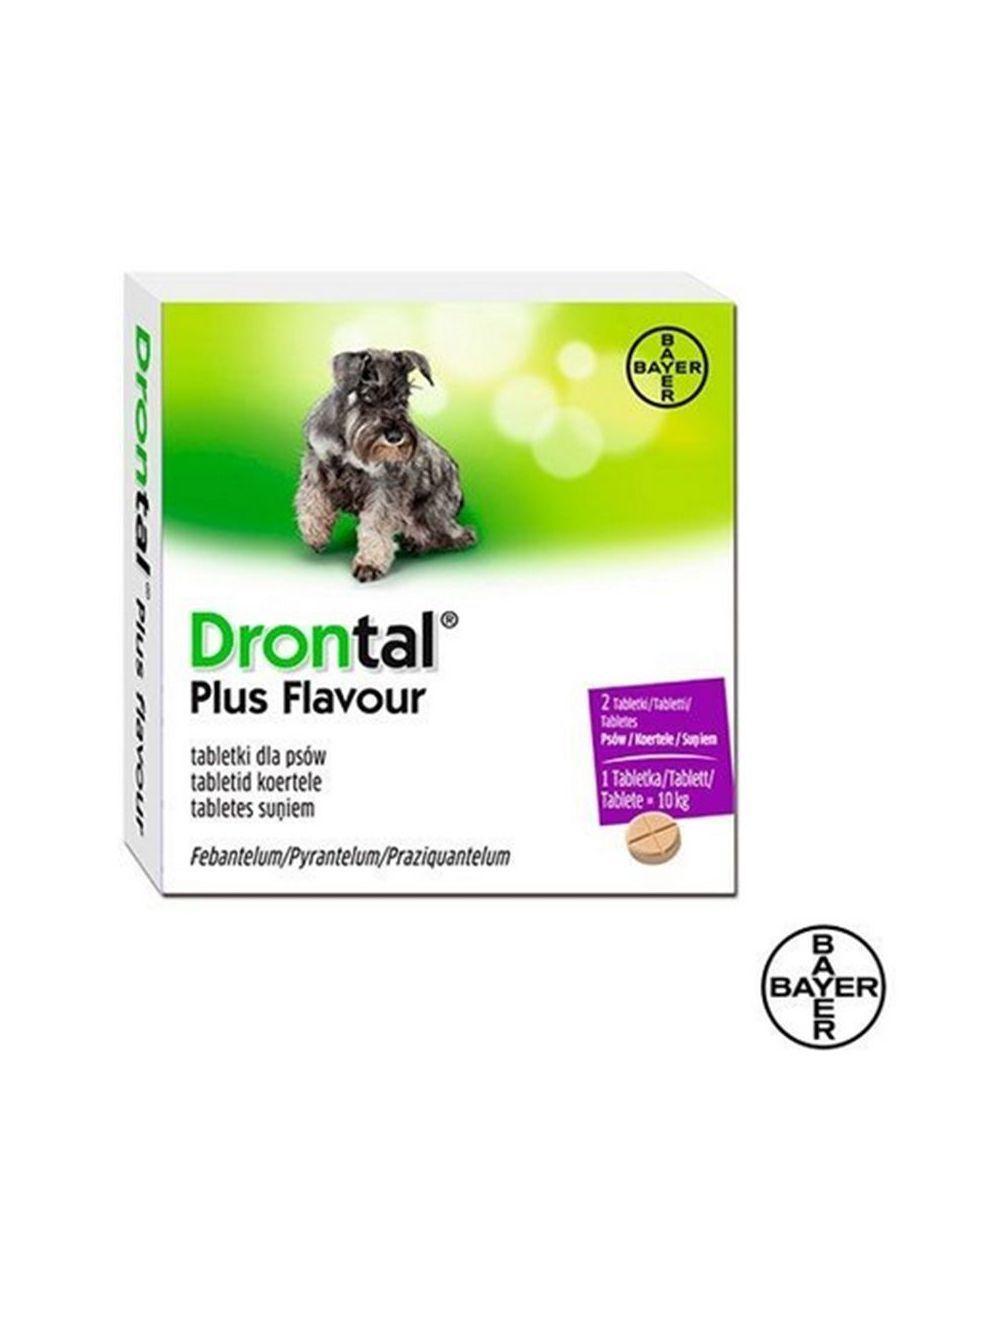 Desparasitante Drontal PS tabletas X 2 - Ciudaddemascotas.com